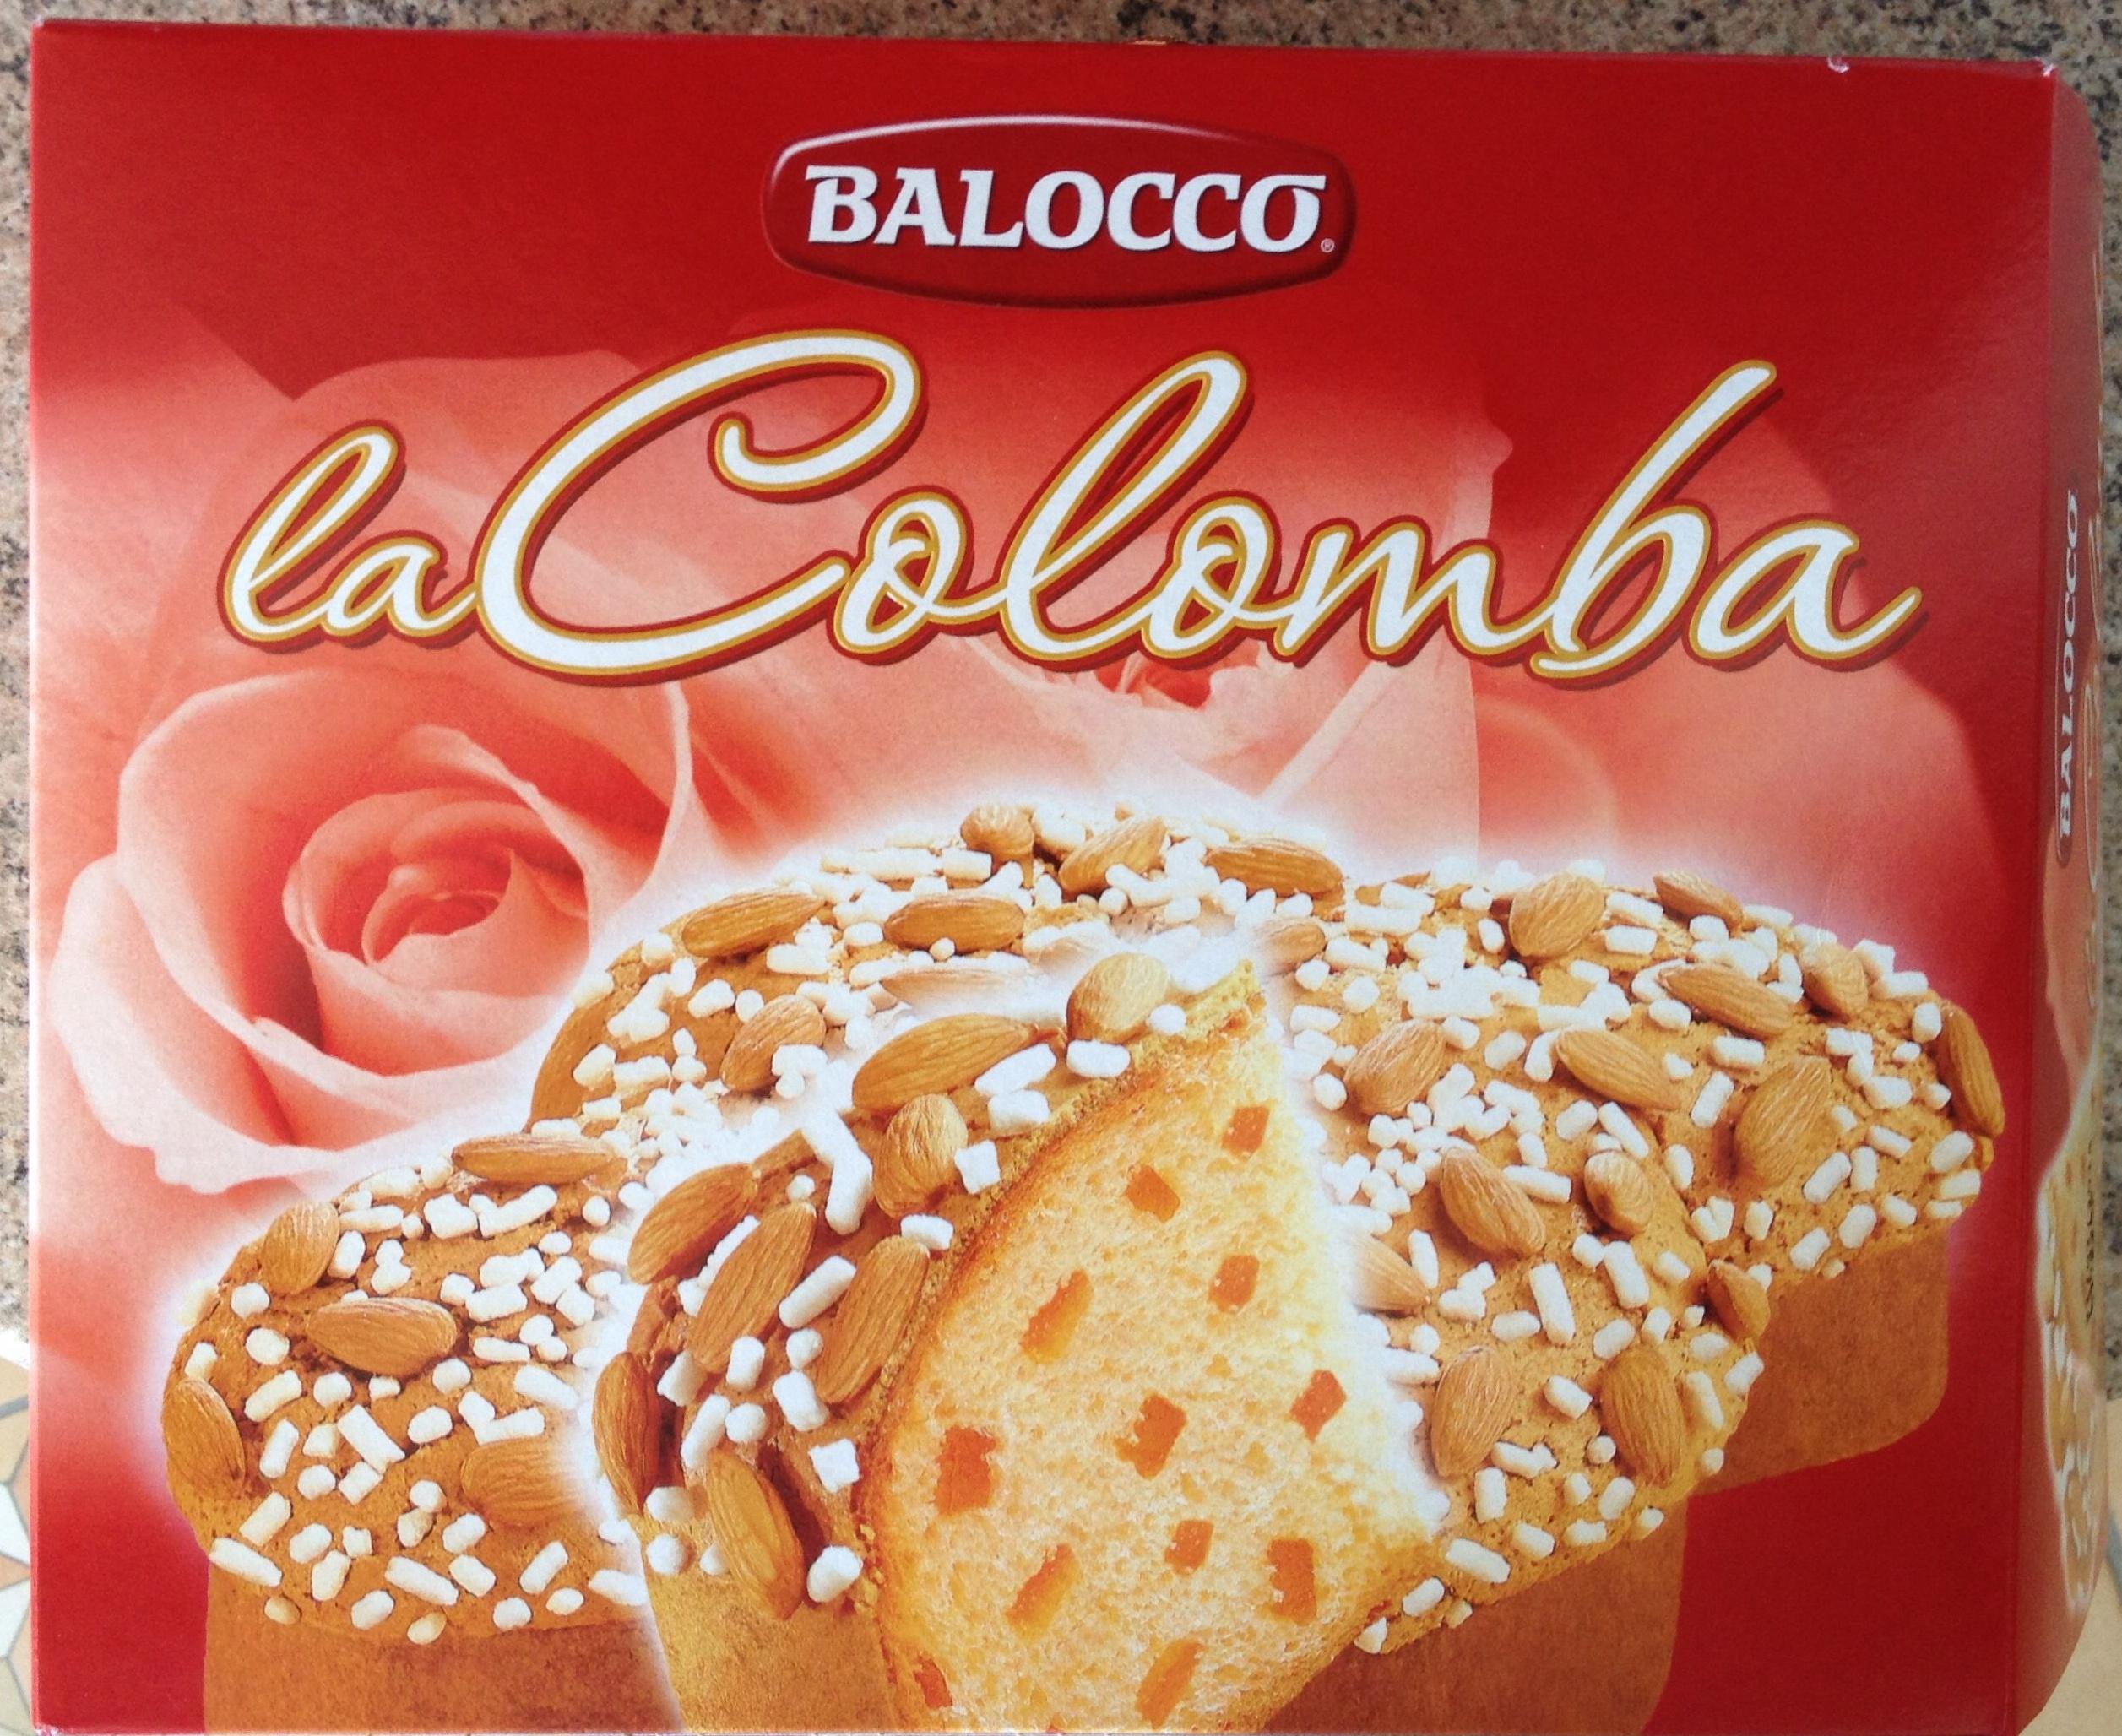 Balocco La colomba - Product - it